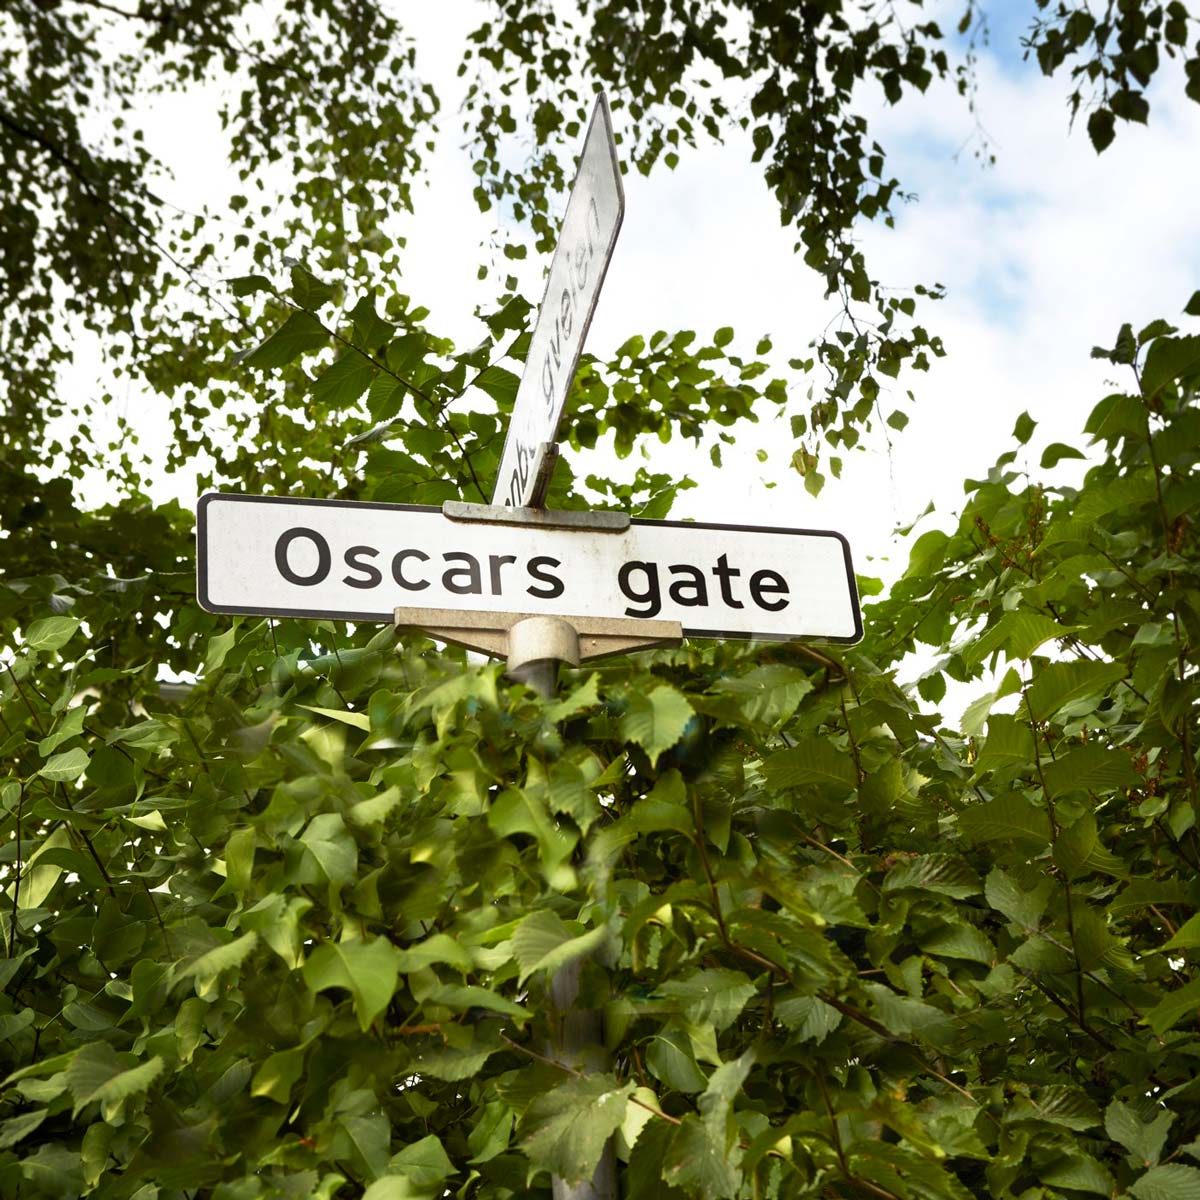 Gateskilt Oscars gate